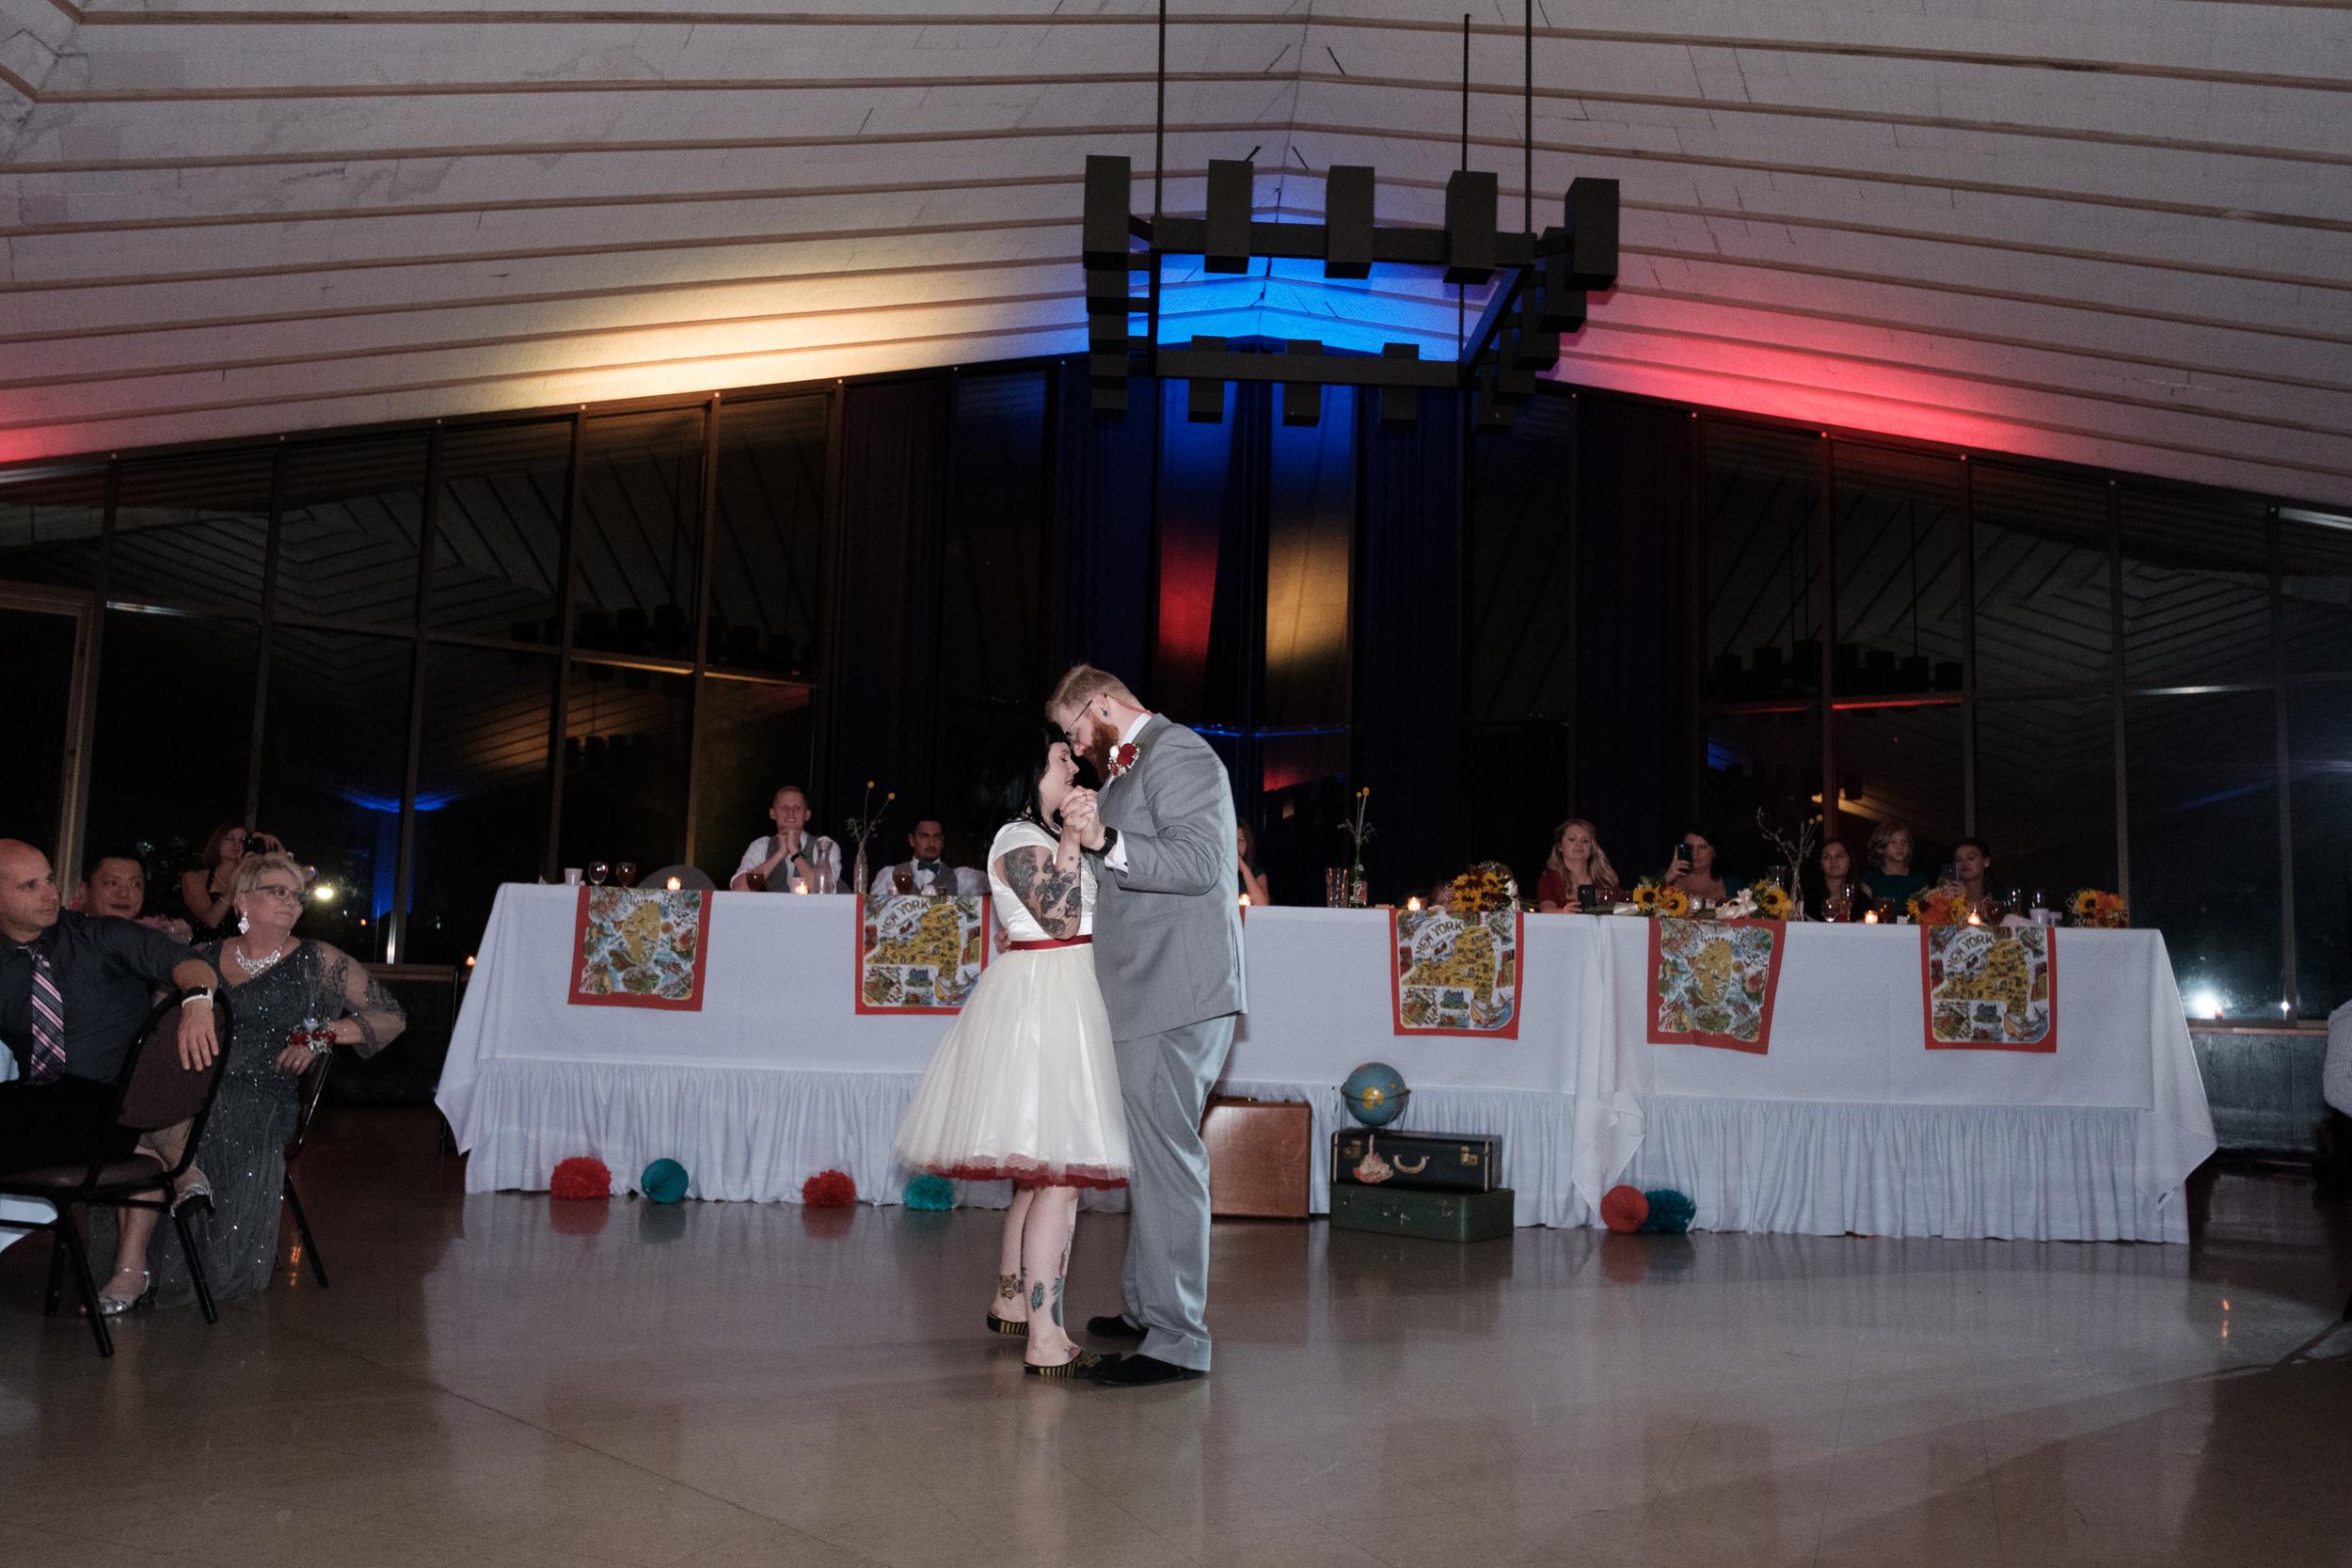 Christian & Sarah wedding photography by Brian milo-254.jpg